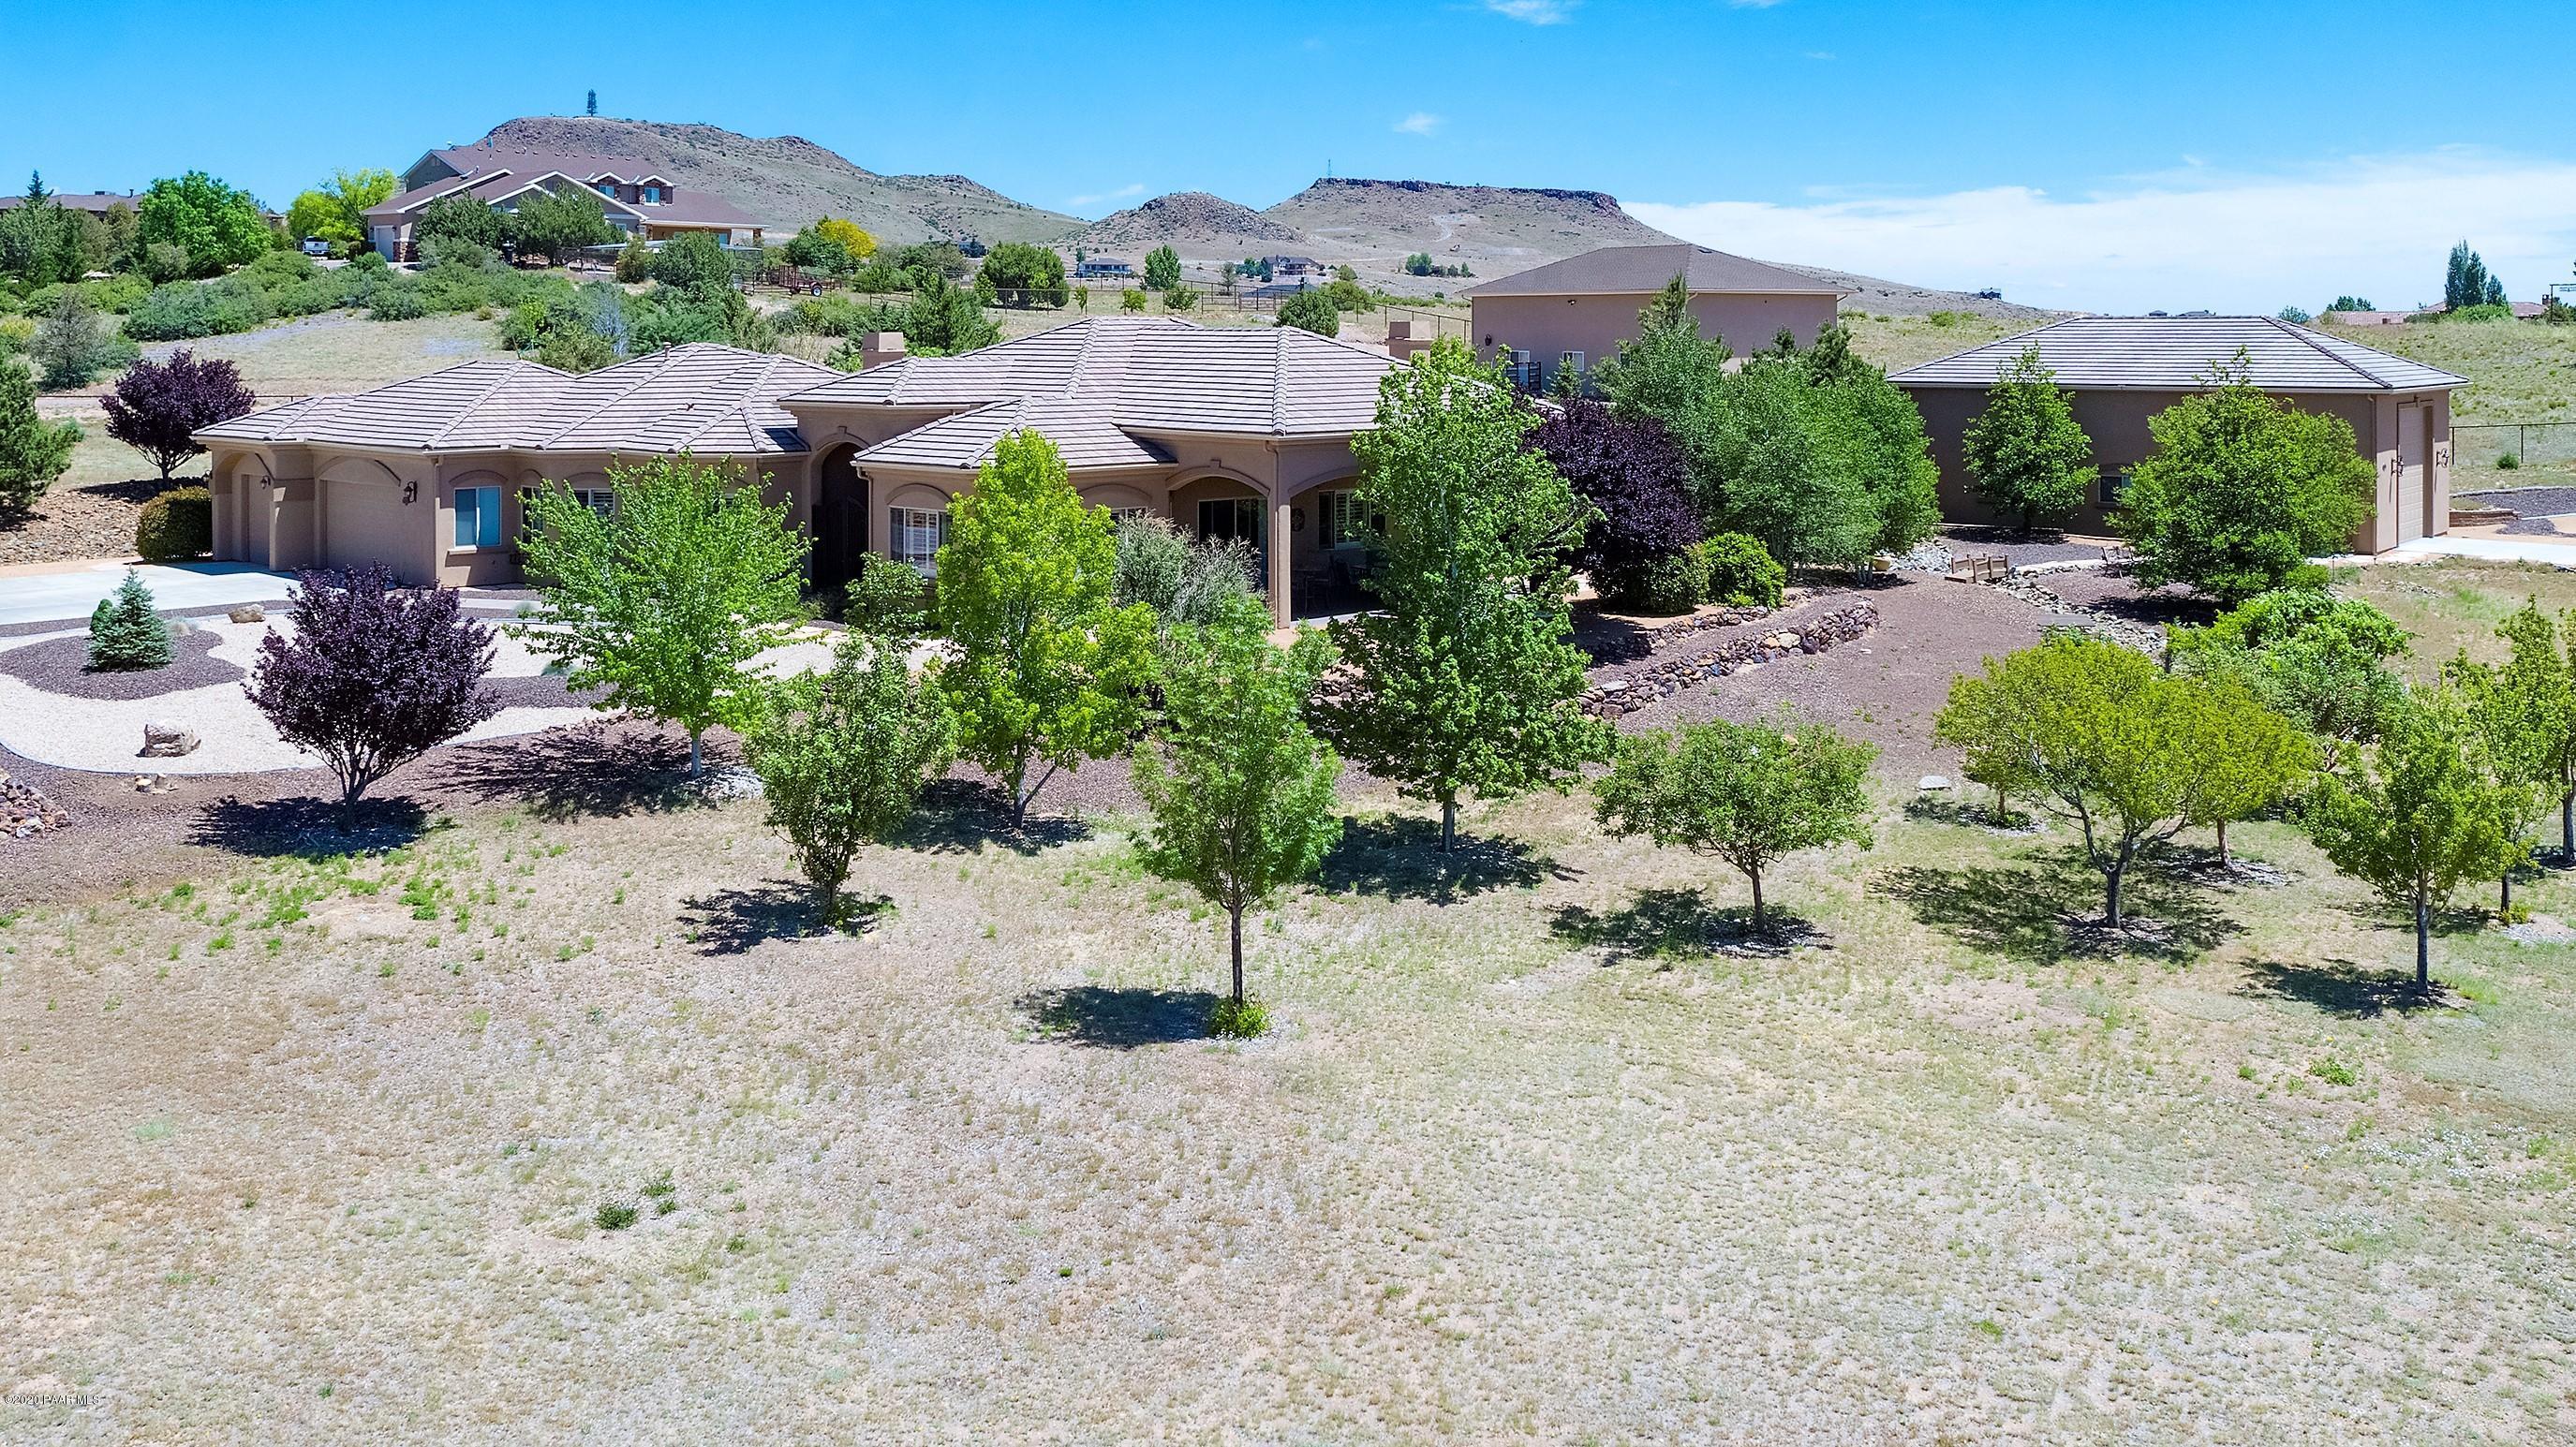 Photo of 11100 Williamson Valley Ranch, Prescott, AZ 86305